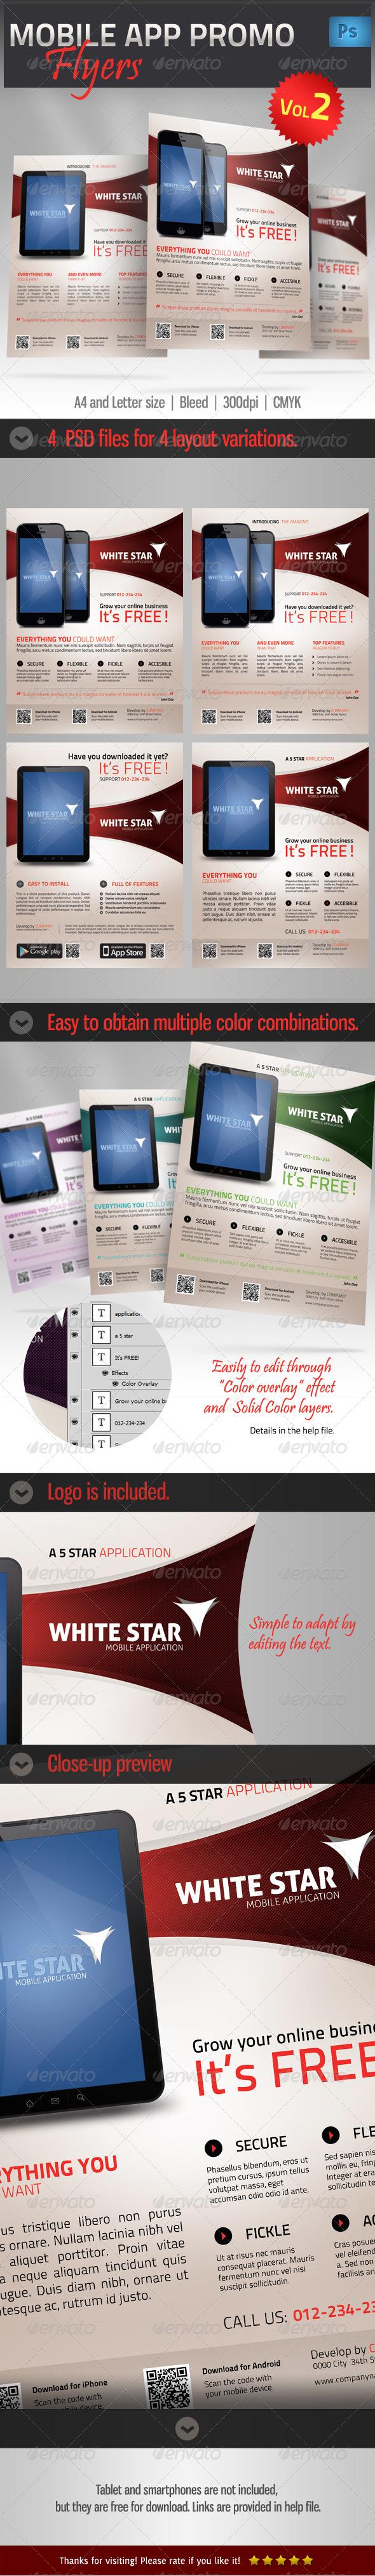 Mobile App Promotion Flyer vol2 - Commerce Flyers